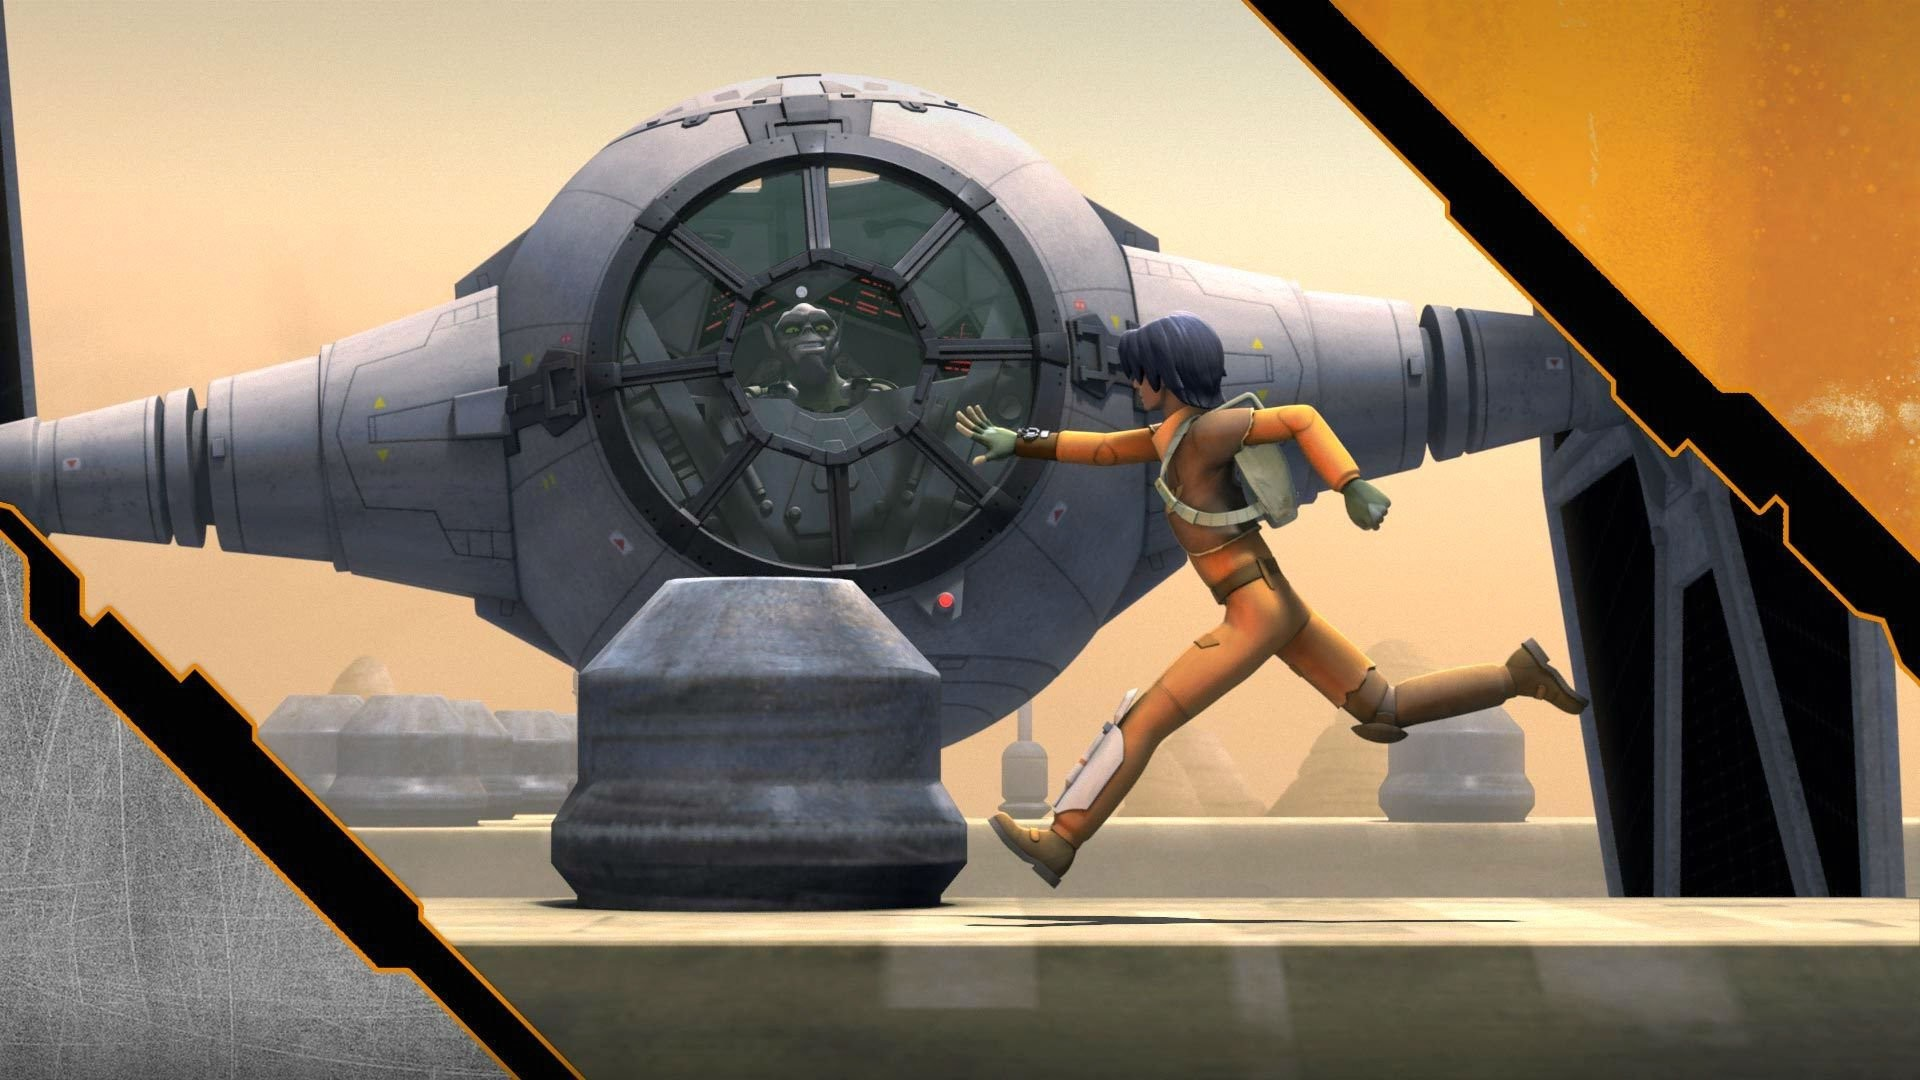 STAR WARS REBELS animated series sci-fi disney action adventure spaceship  wallpaper | | 533680 | WallpaperUP